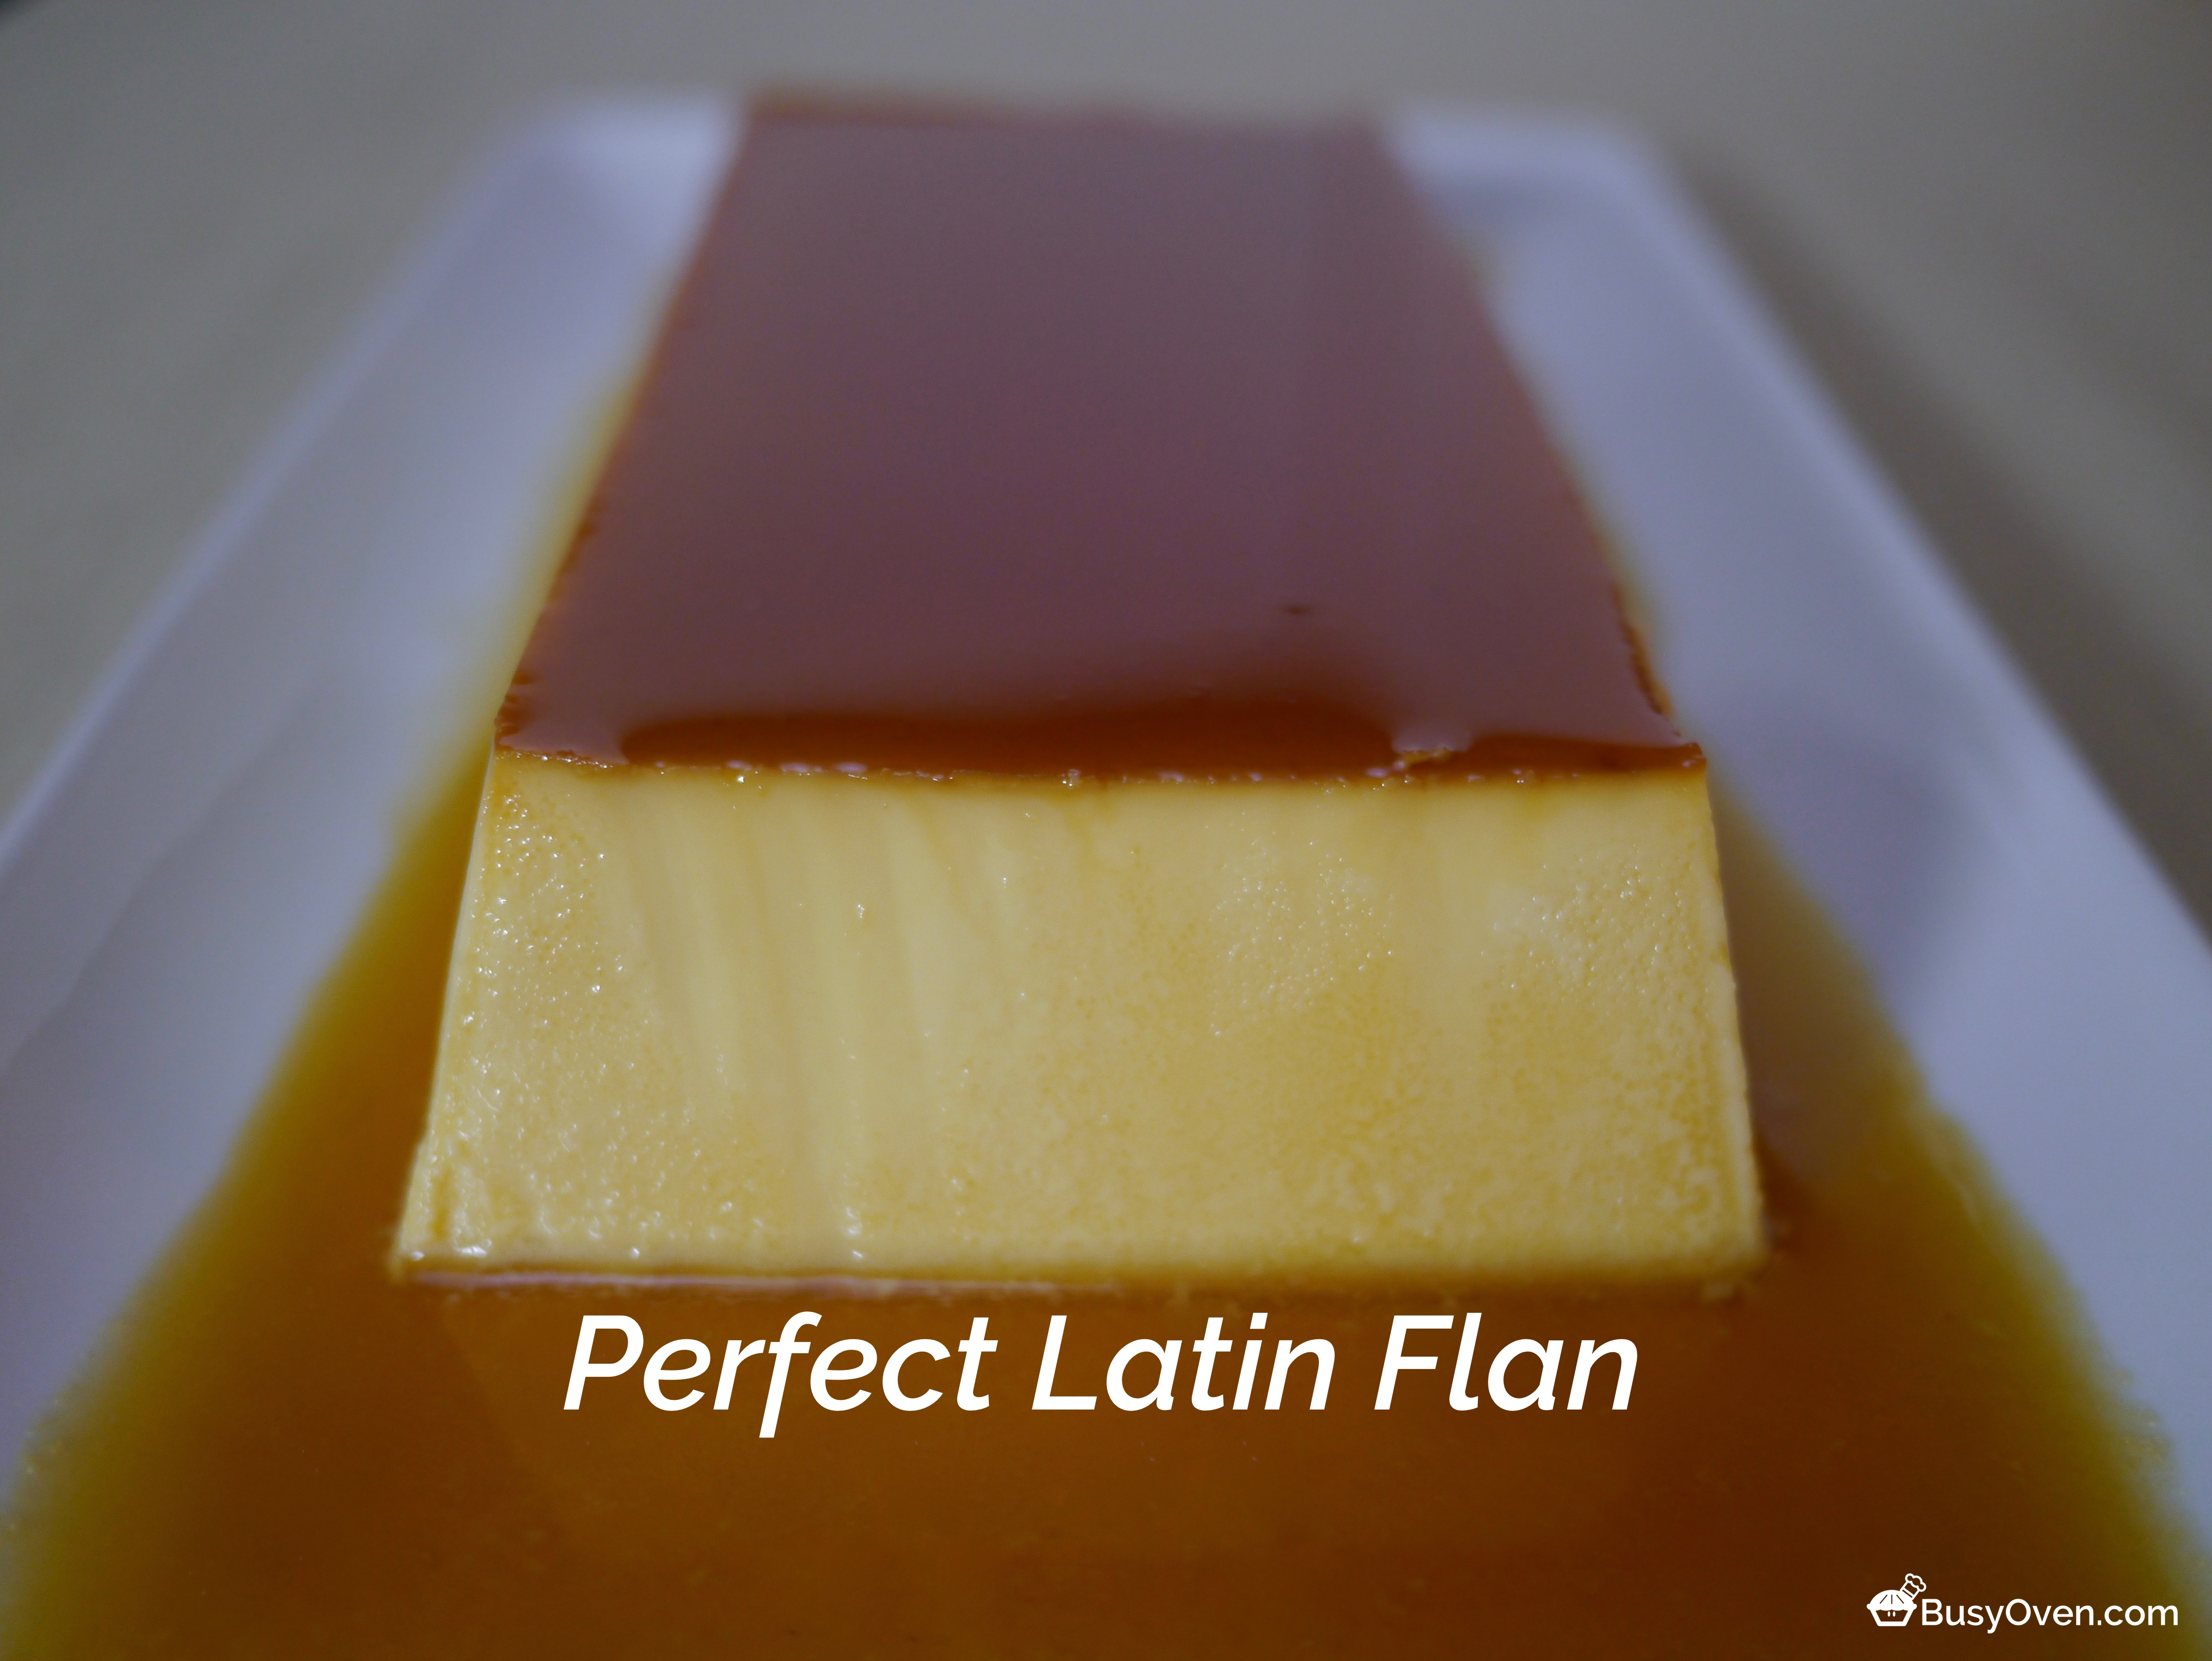 Perfect Latin Flan